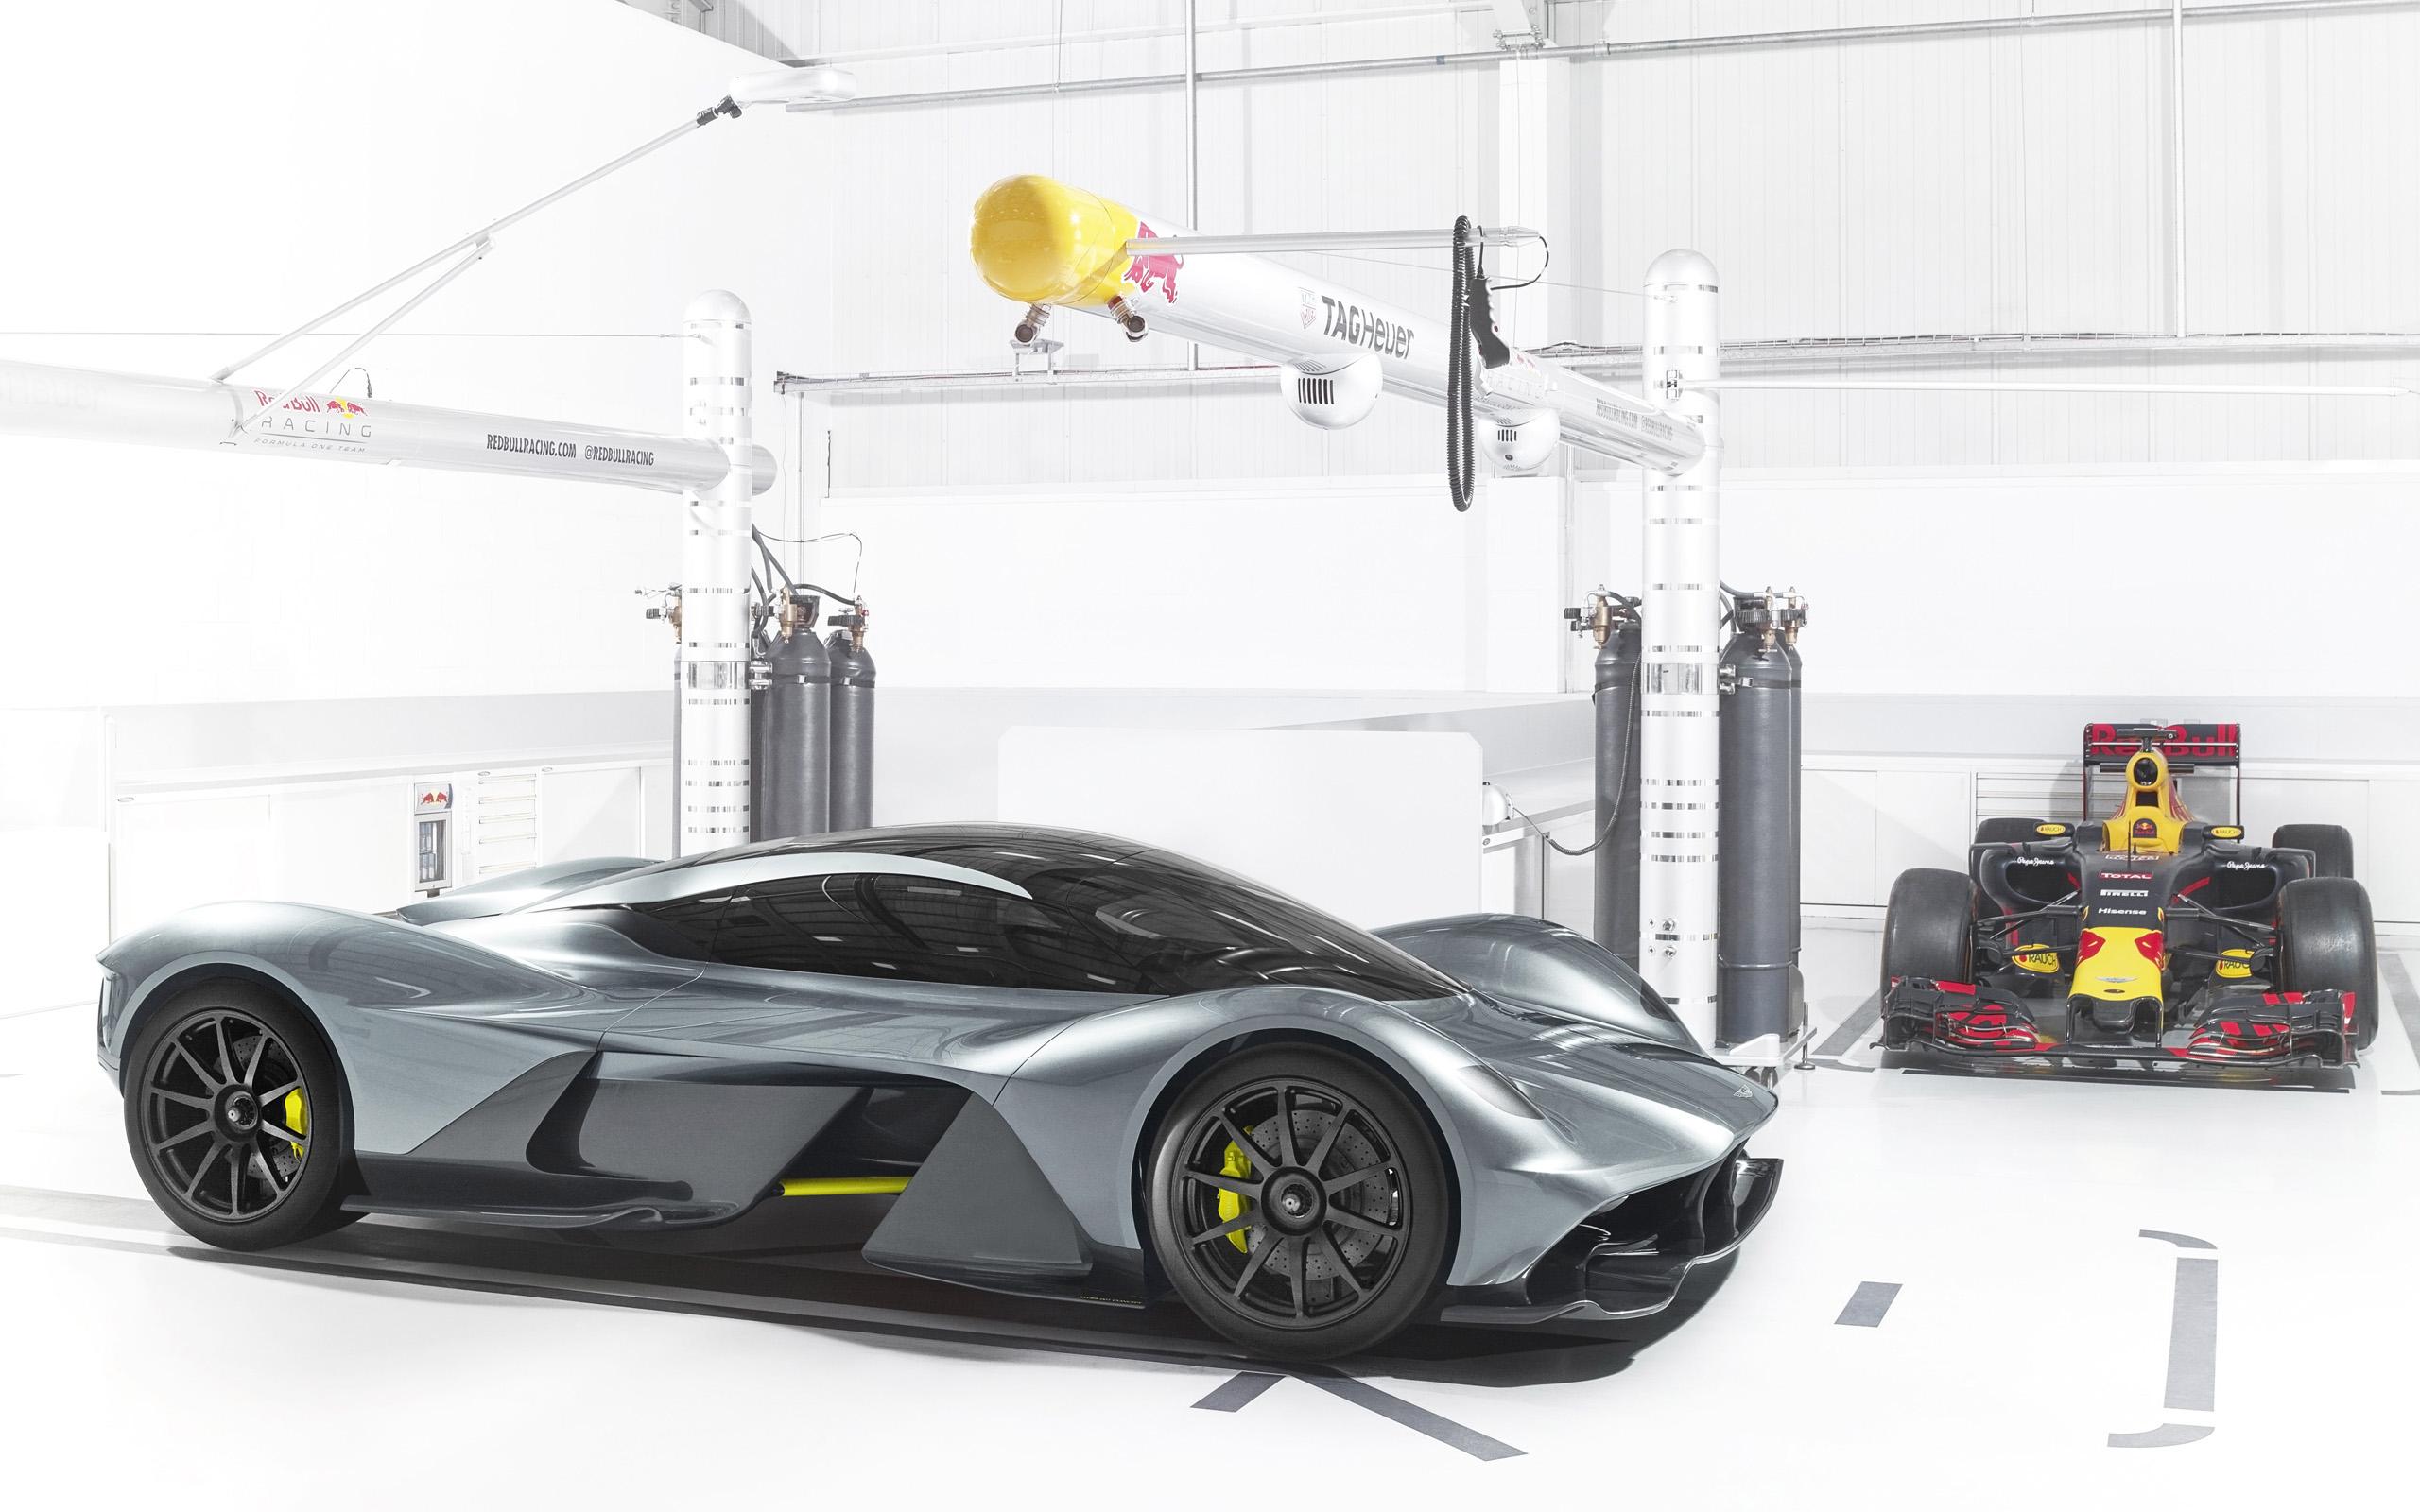 2018 Aston Martin Red Bull Am Rb 4 Wallpaper Hd Car Wallpapers Id 6763